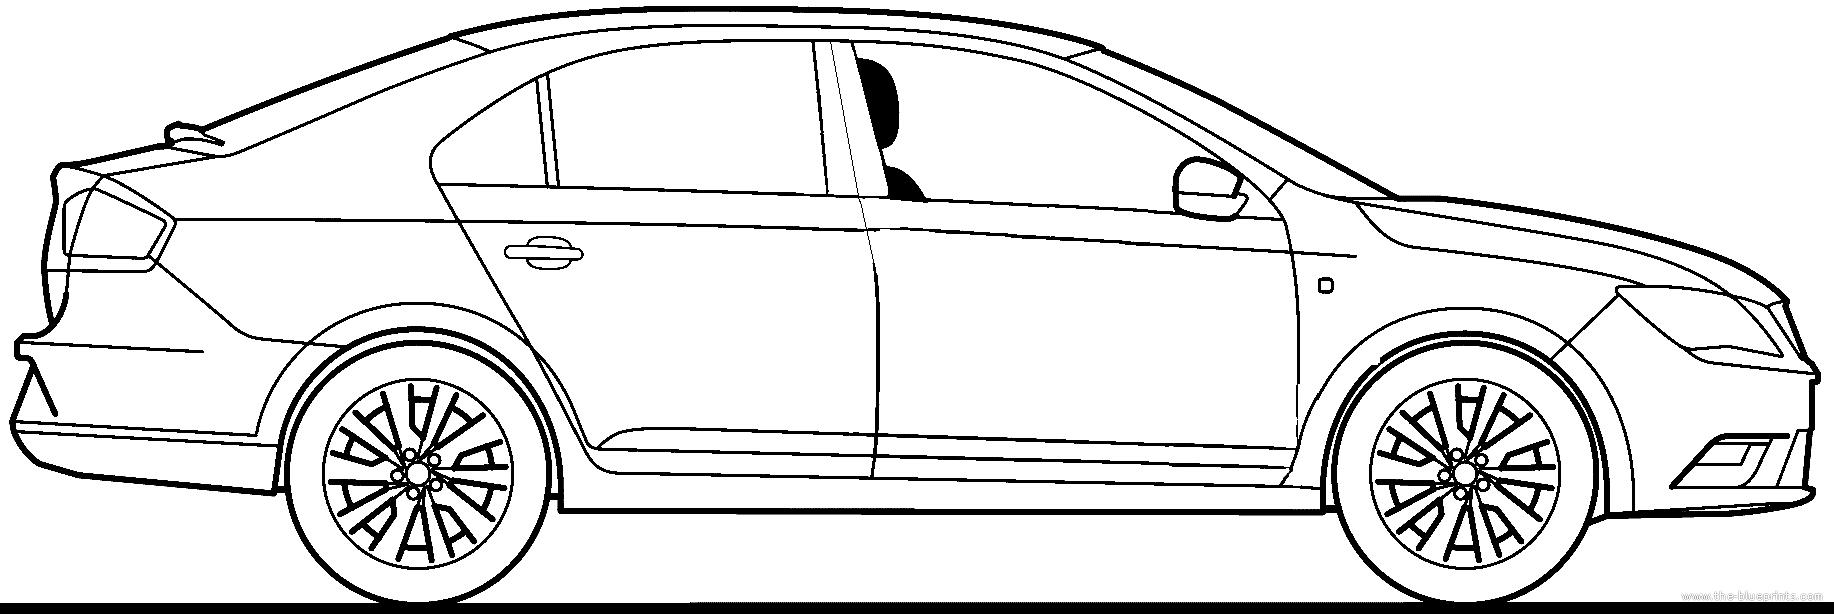 Blueprints cars seat seat toledo 2013 seat toledo 2013 malvernweather Images